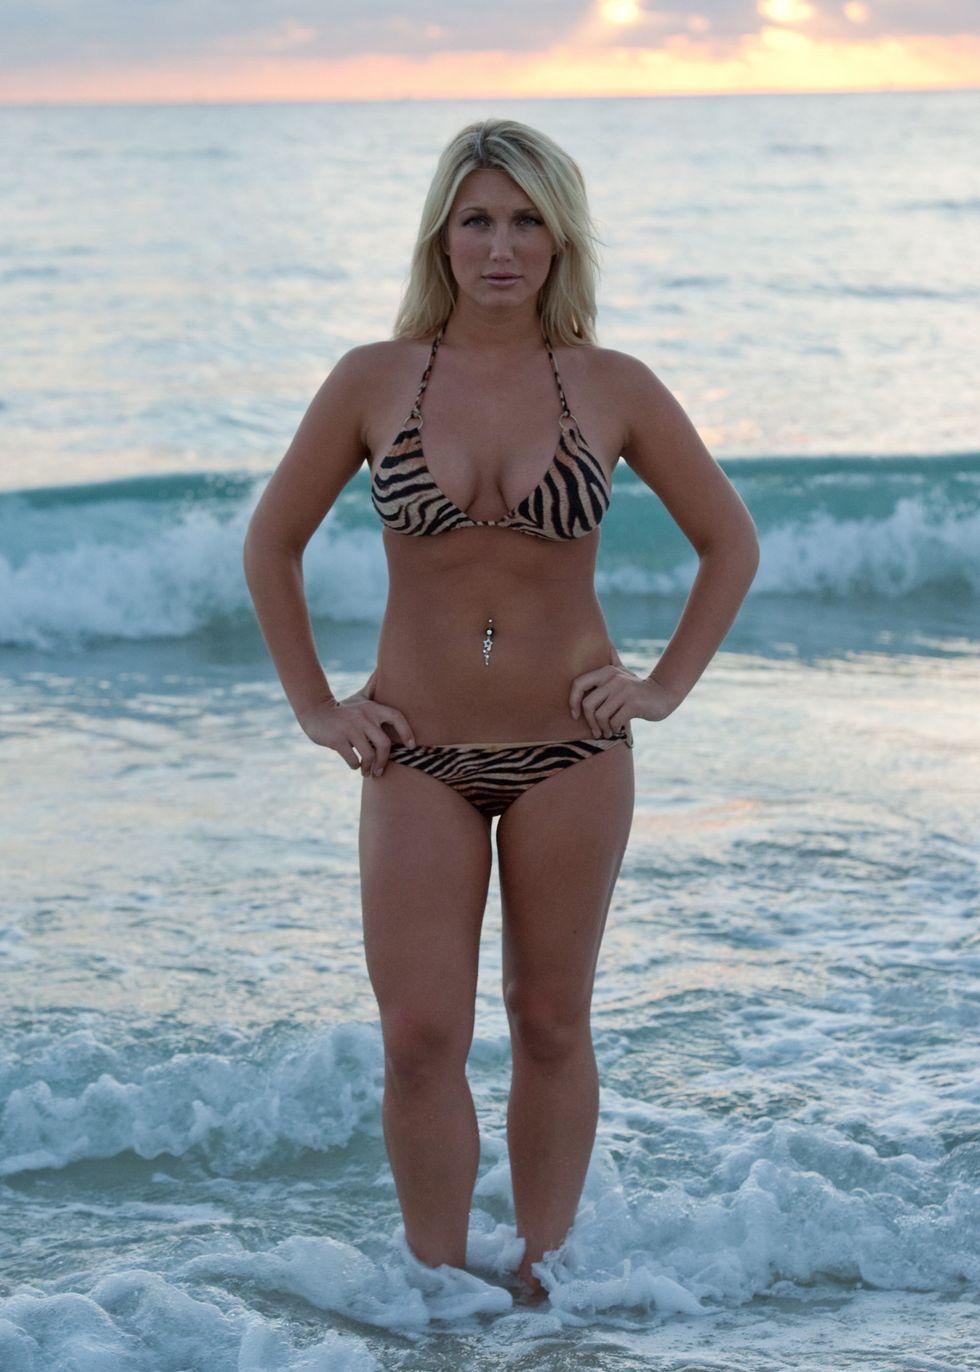 brooke hogan in bikini for a shoot in miami beach 08 | GotCeleb